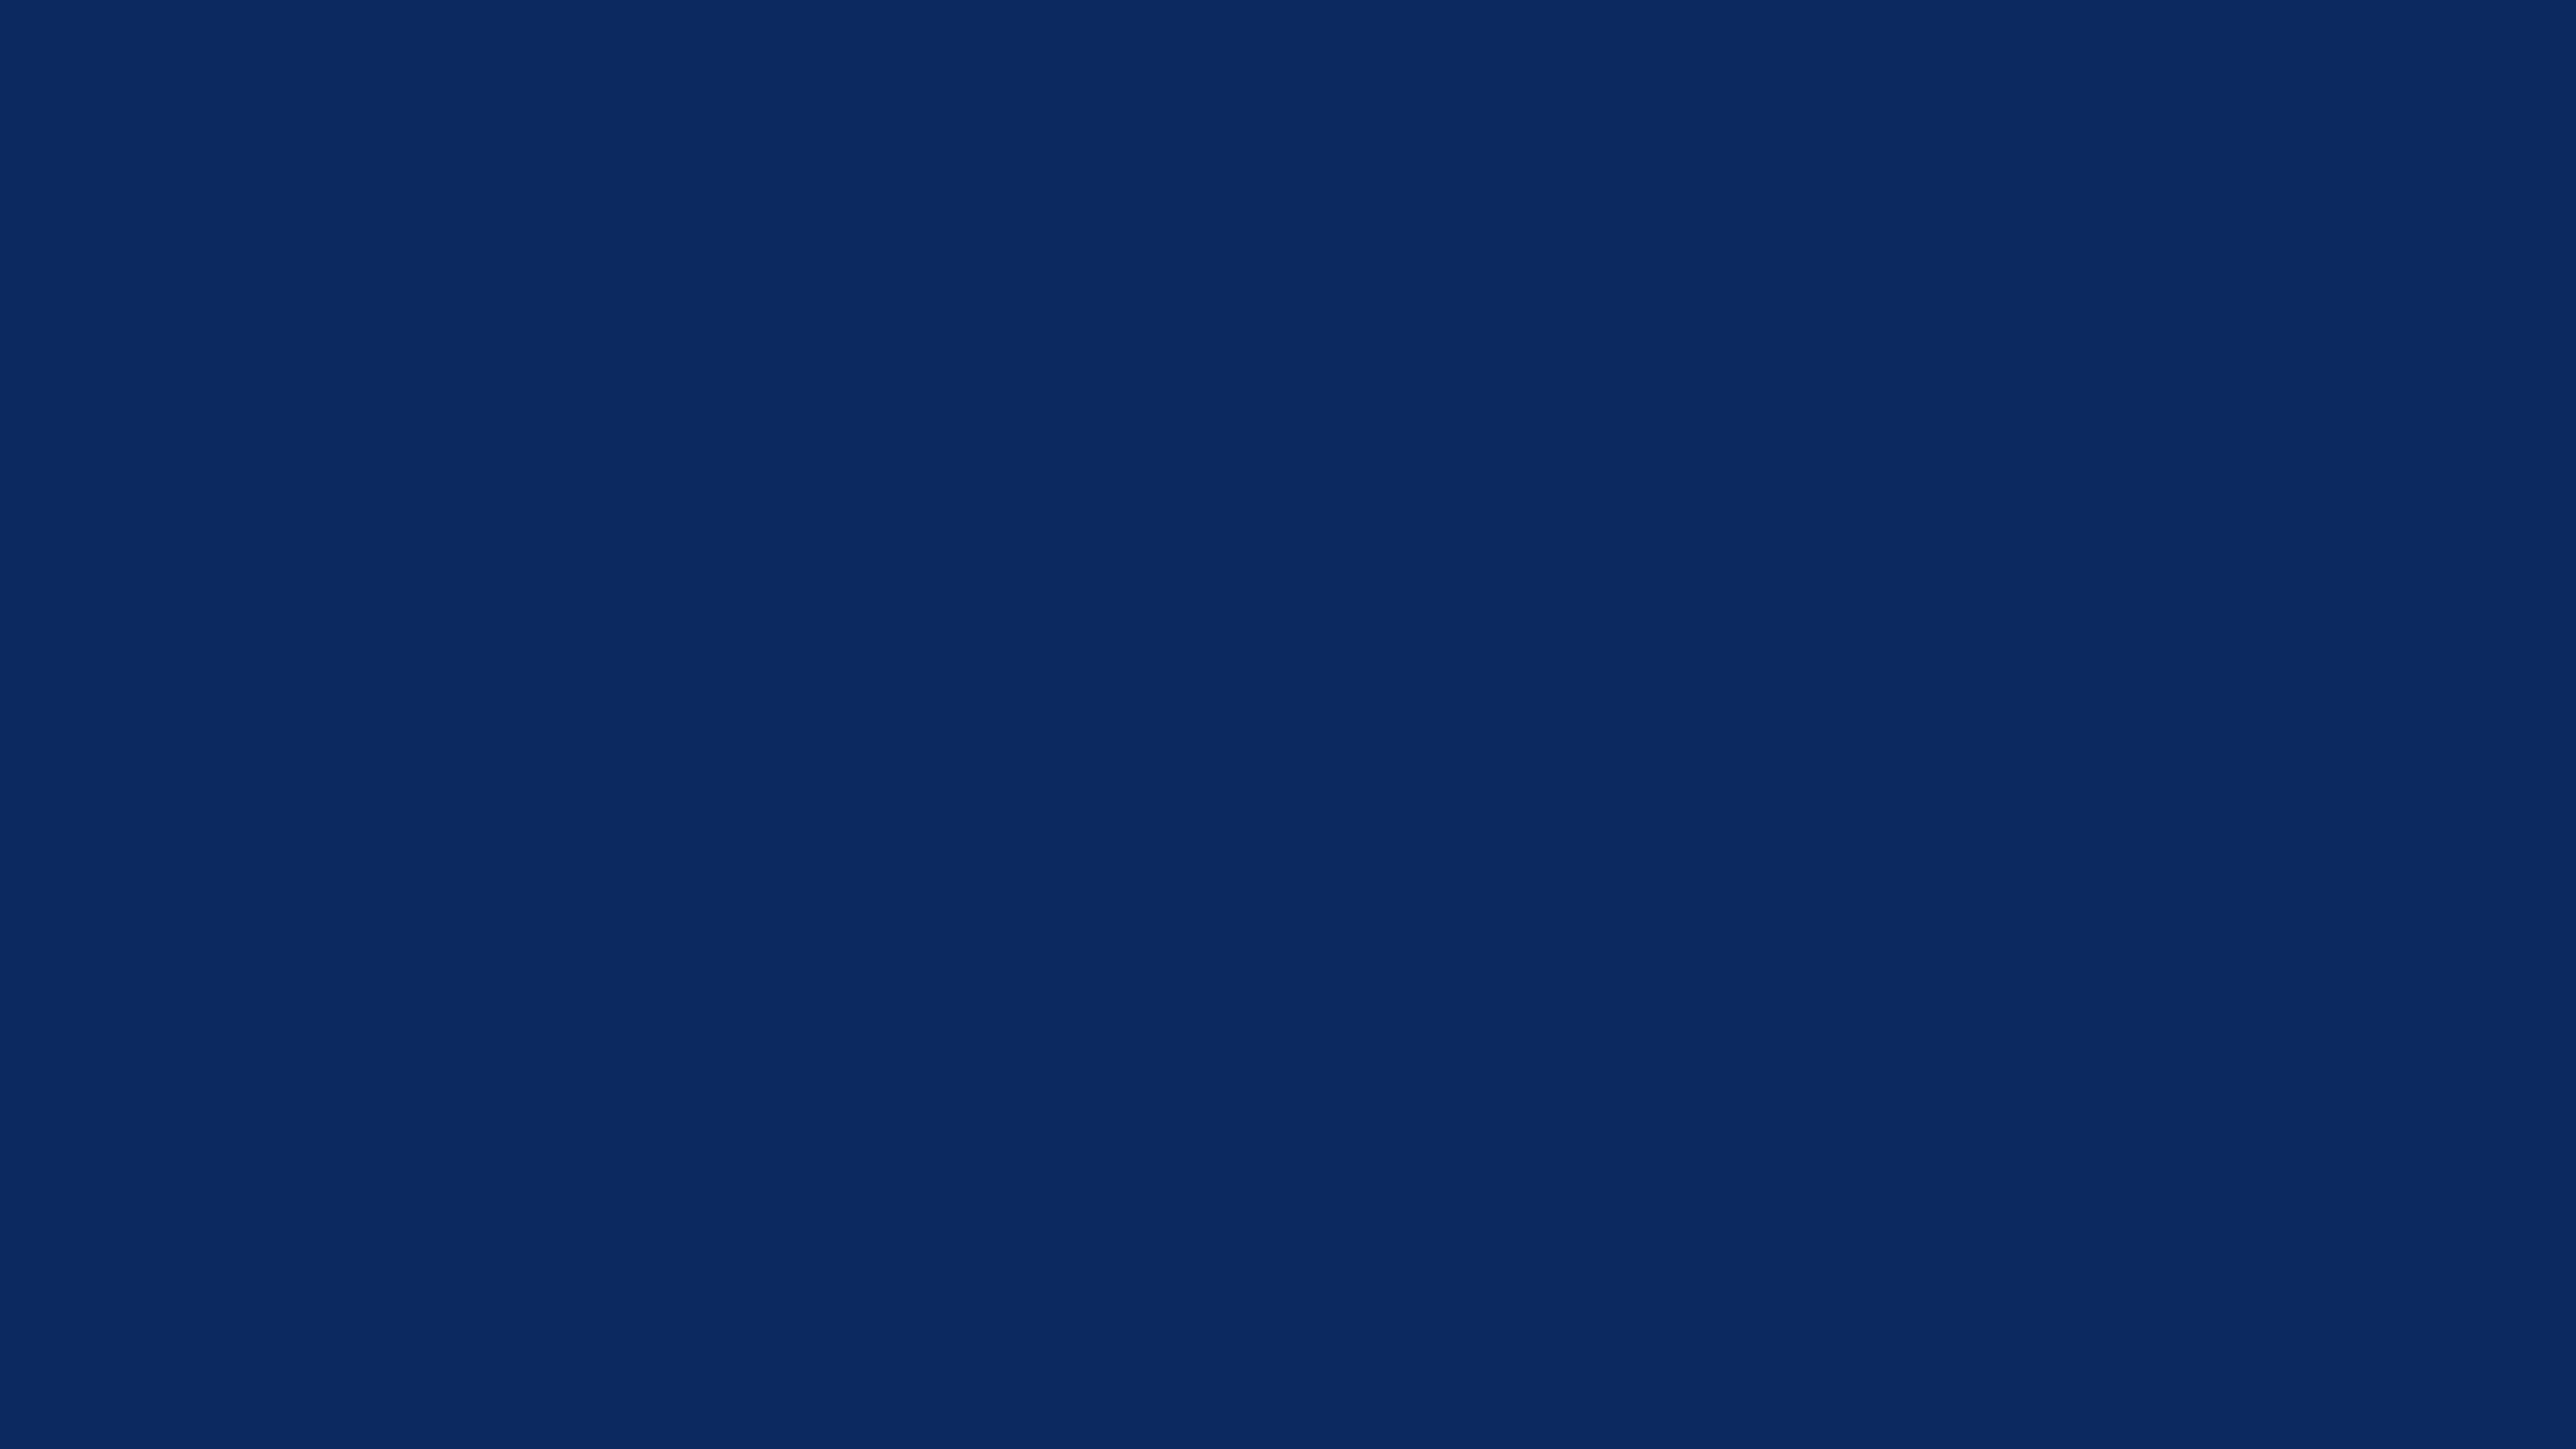 0c295f   Solid blue 8K background 7680 4320 300dpi Blue 7680x4320